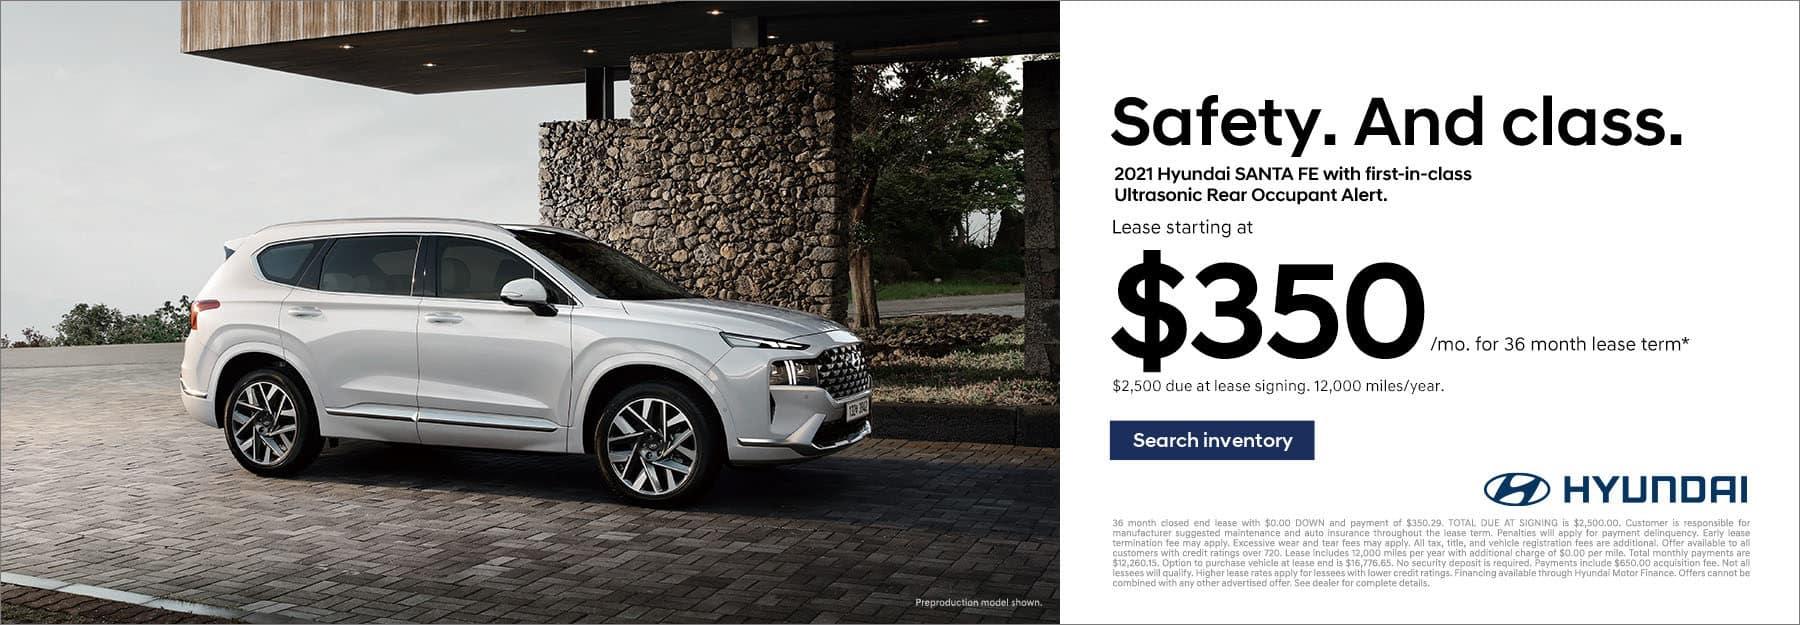 2021 Hyundai Santa Fe Lease Offer